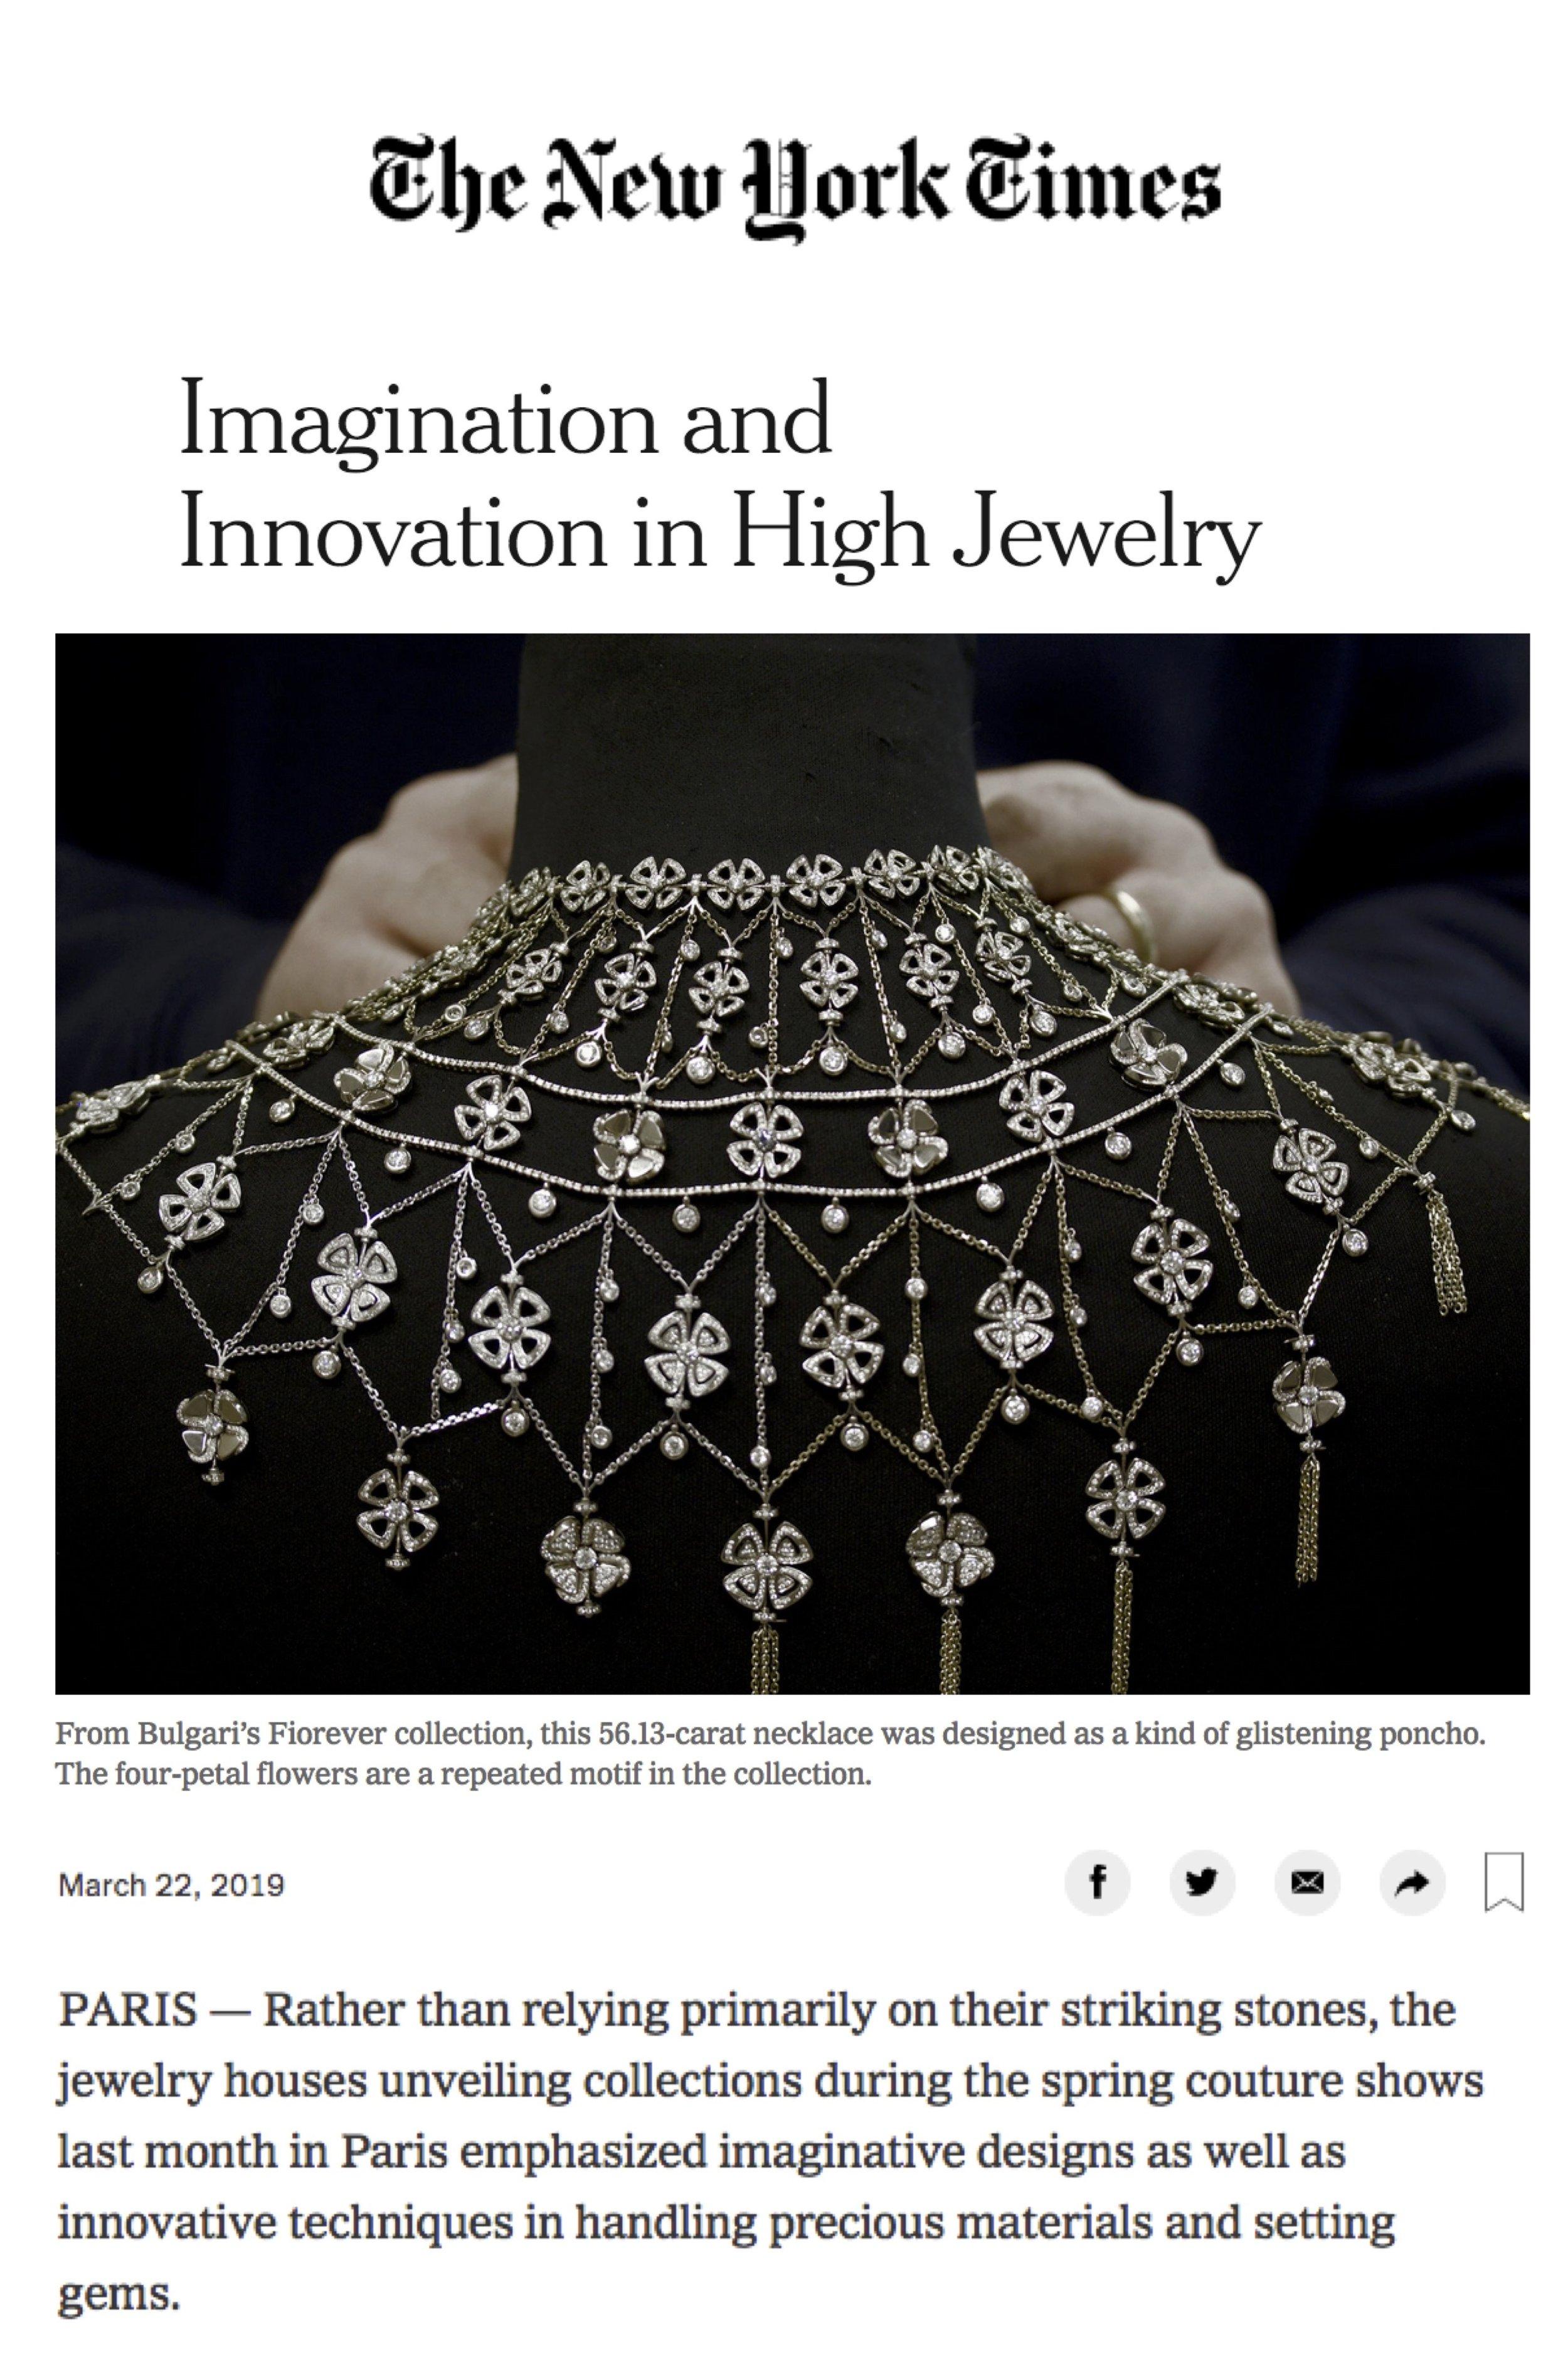 jpeg www.nytimes.com_p1.jpg